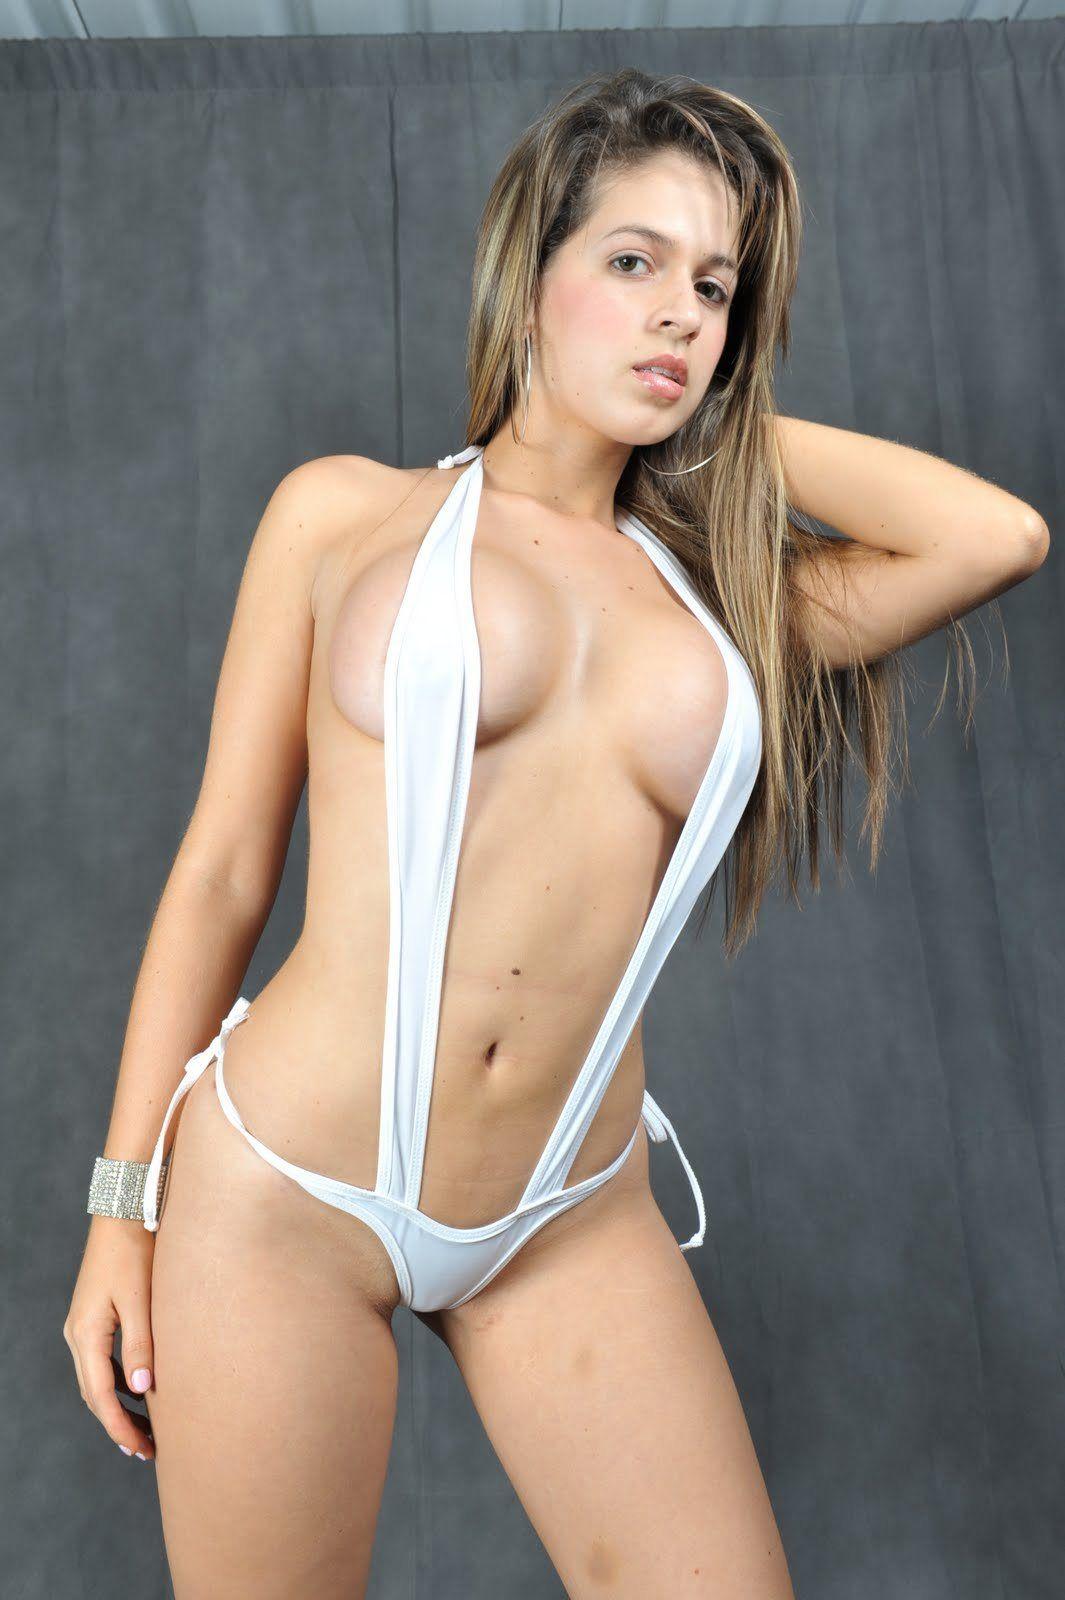 Saray desnuda ropa interior foto 86